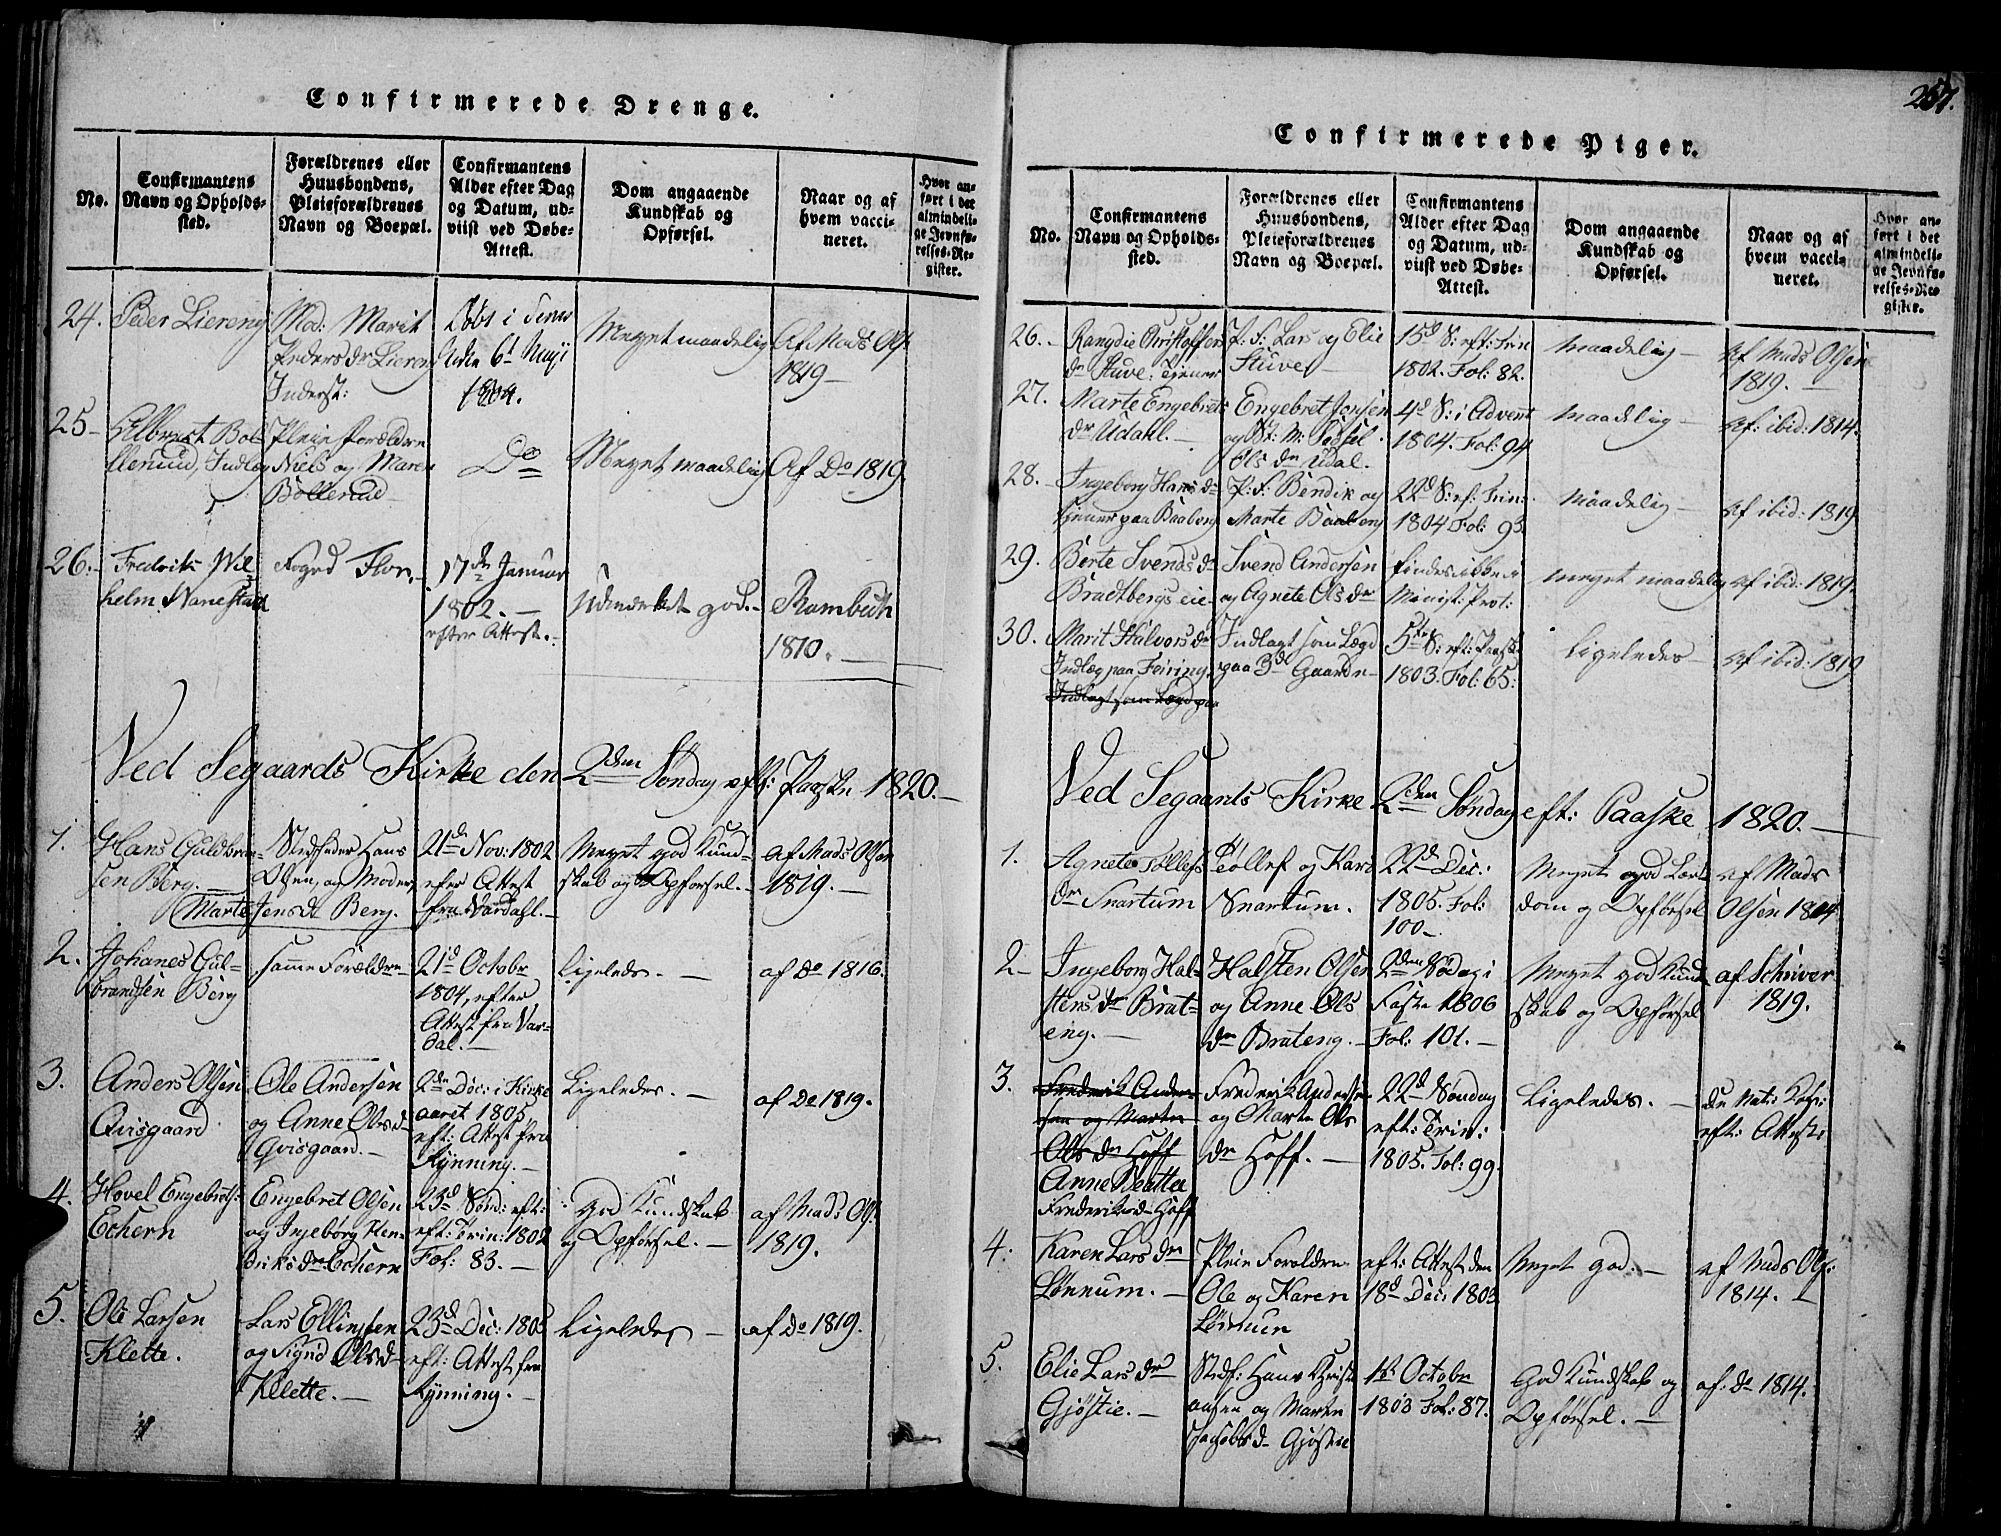 SAH, Biri prestekontor, Ministerialbok nr. 3, 1814-1828, s. 257